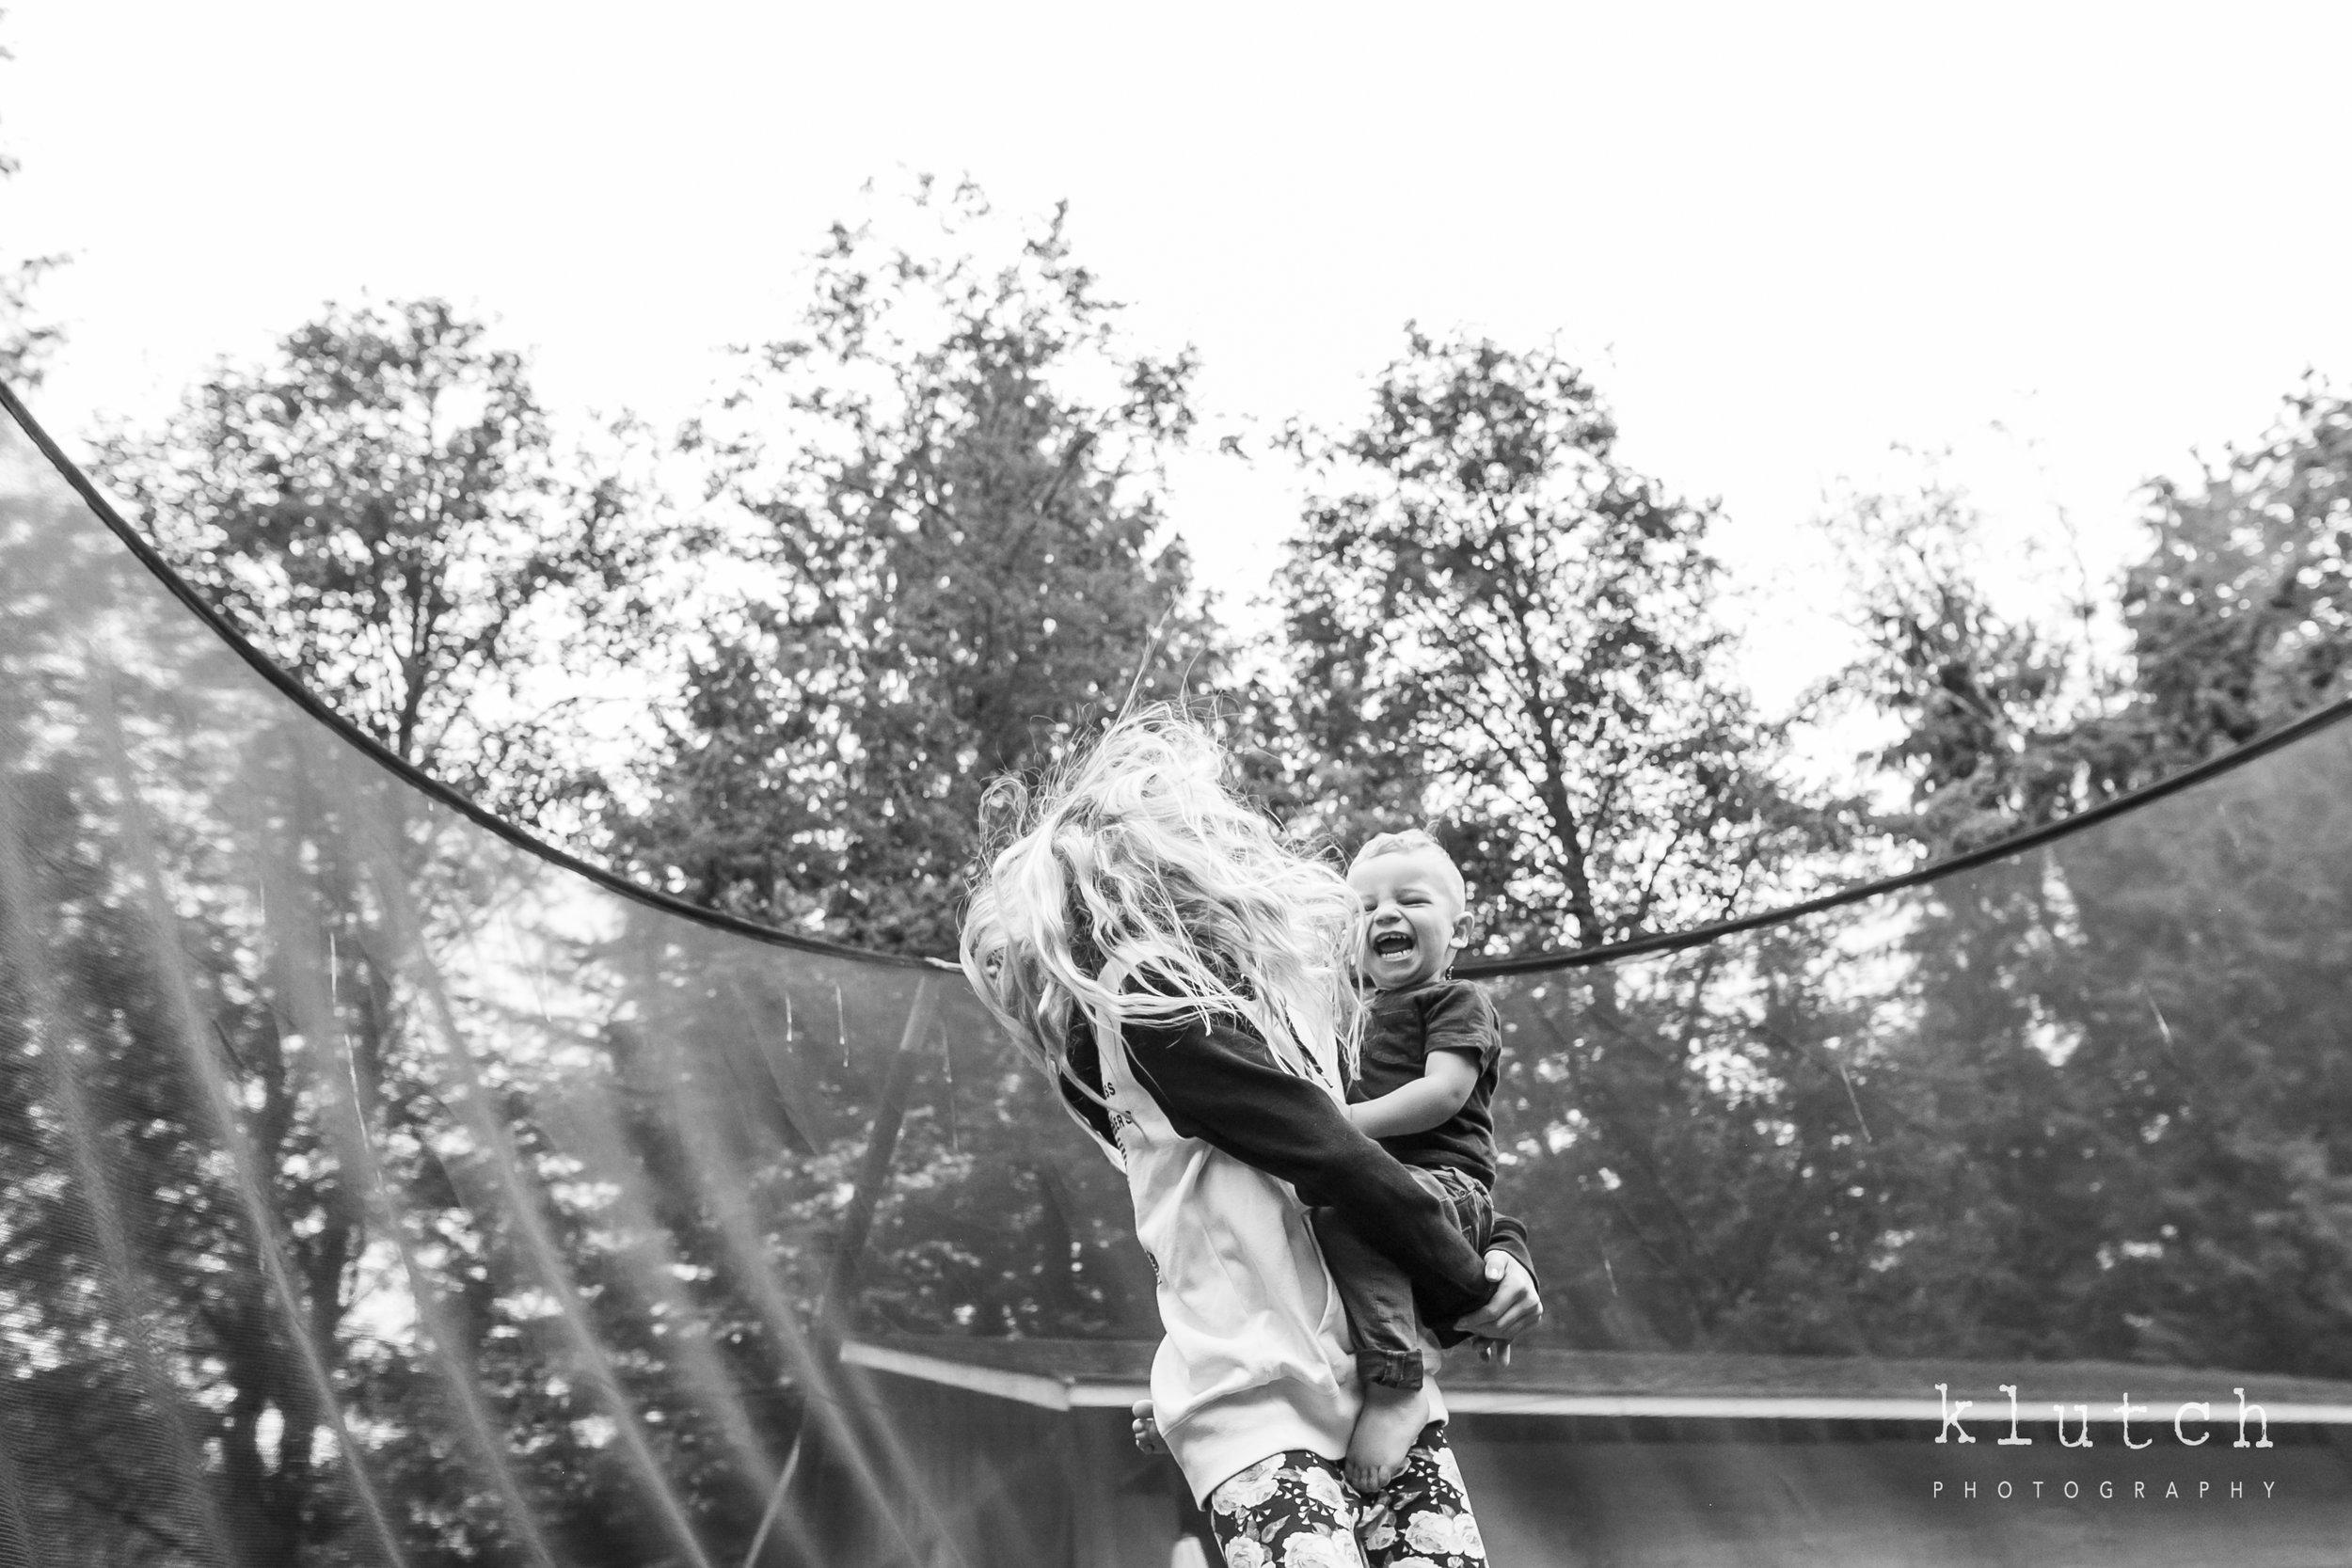 Surrey Family Photographer. Vancouver family photographer, klutch Photography, documentary photography, Vancouver documentary photographer, candid photography, lifestyle photographer, a day in the life session, family photography, Vancouver Photographer, Surrey Family Photographer, White Rock family Photographer, Dina Ferreira Stoddard, little boy bouncing with sister-0186.jpg